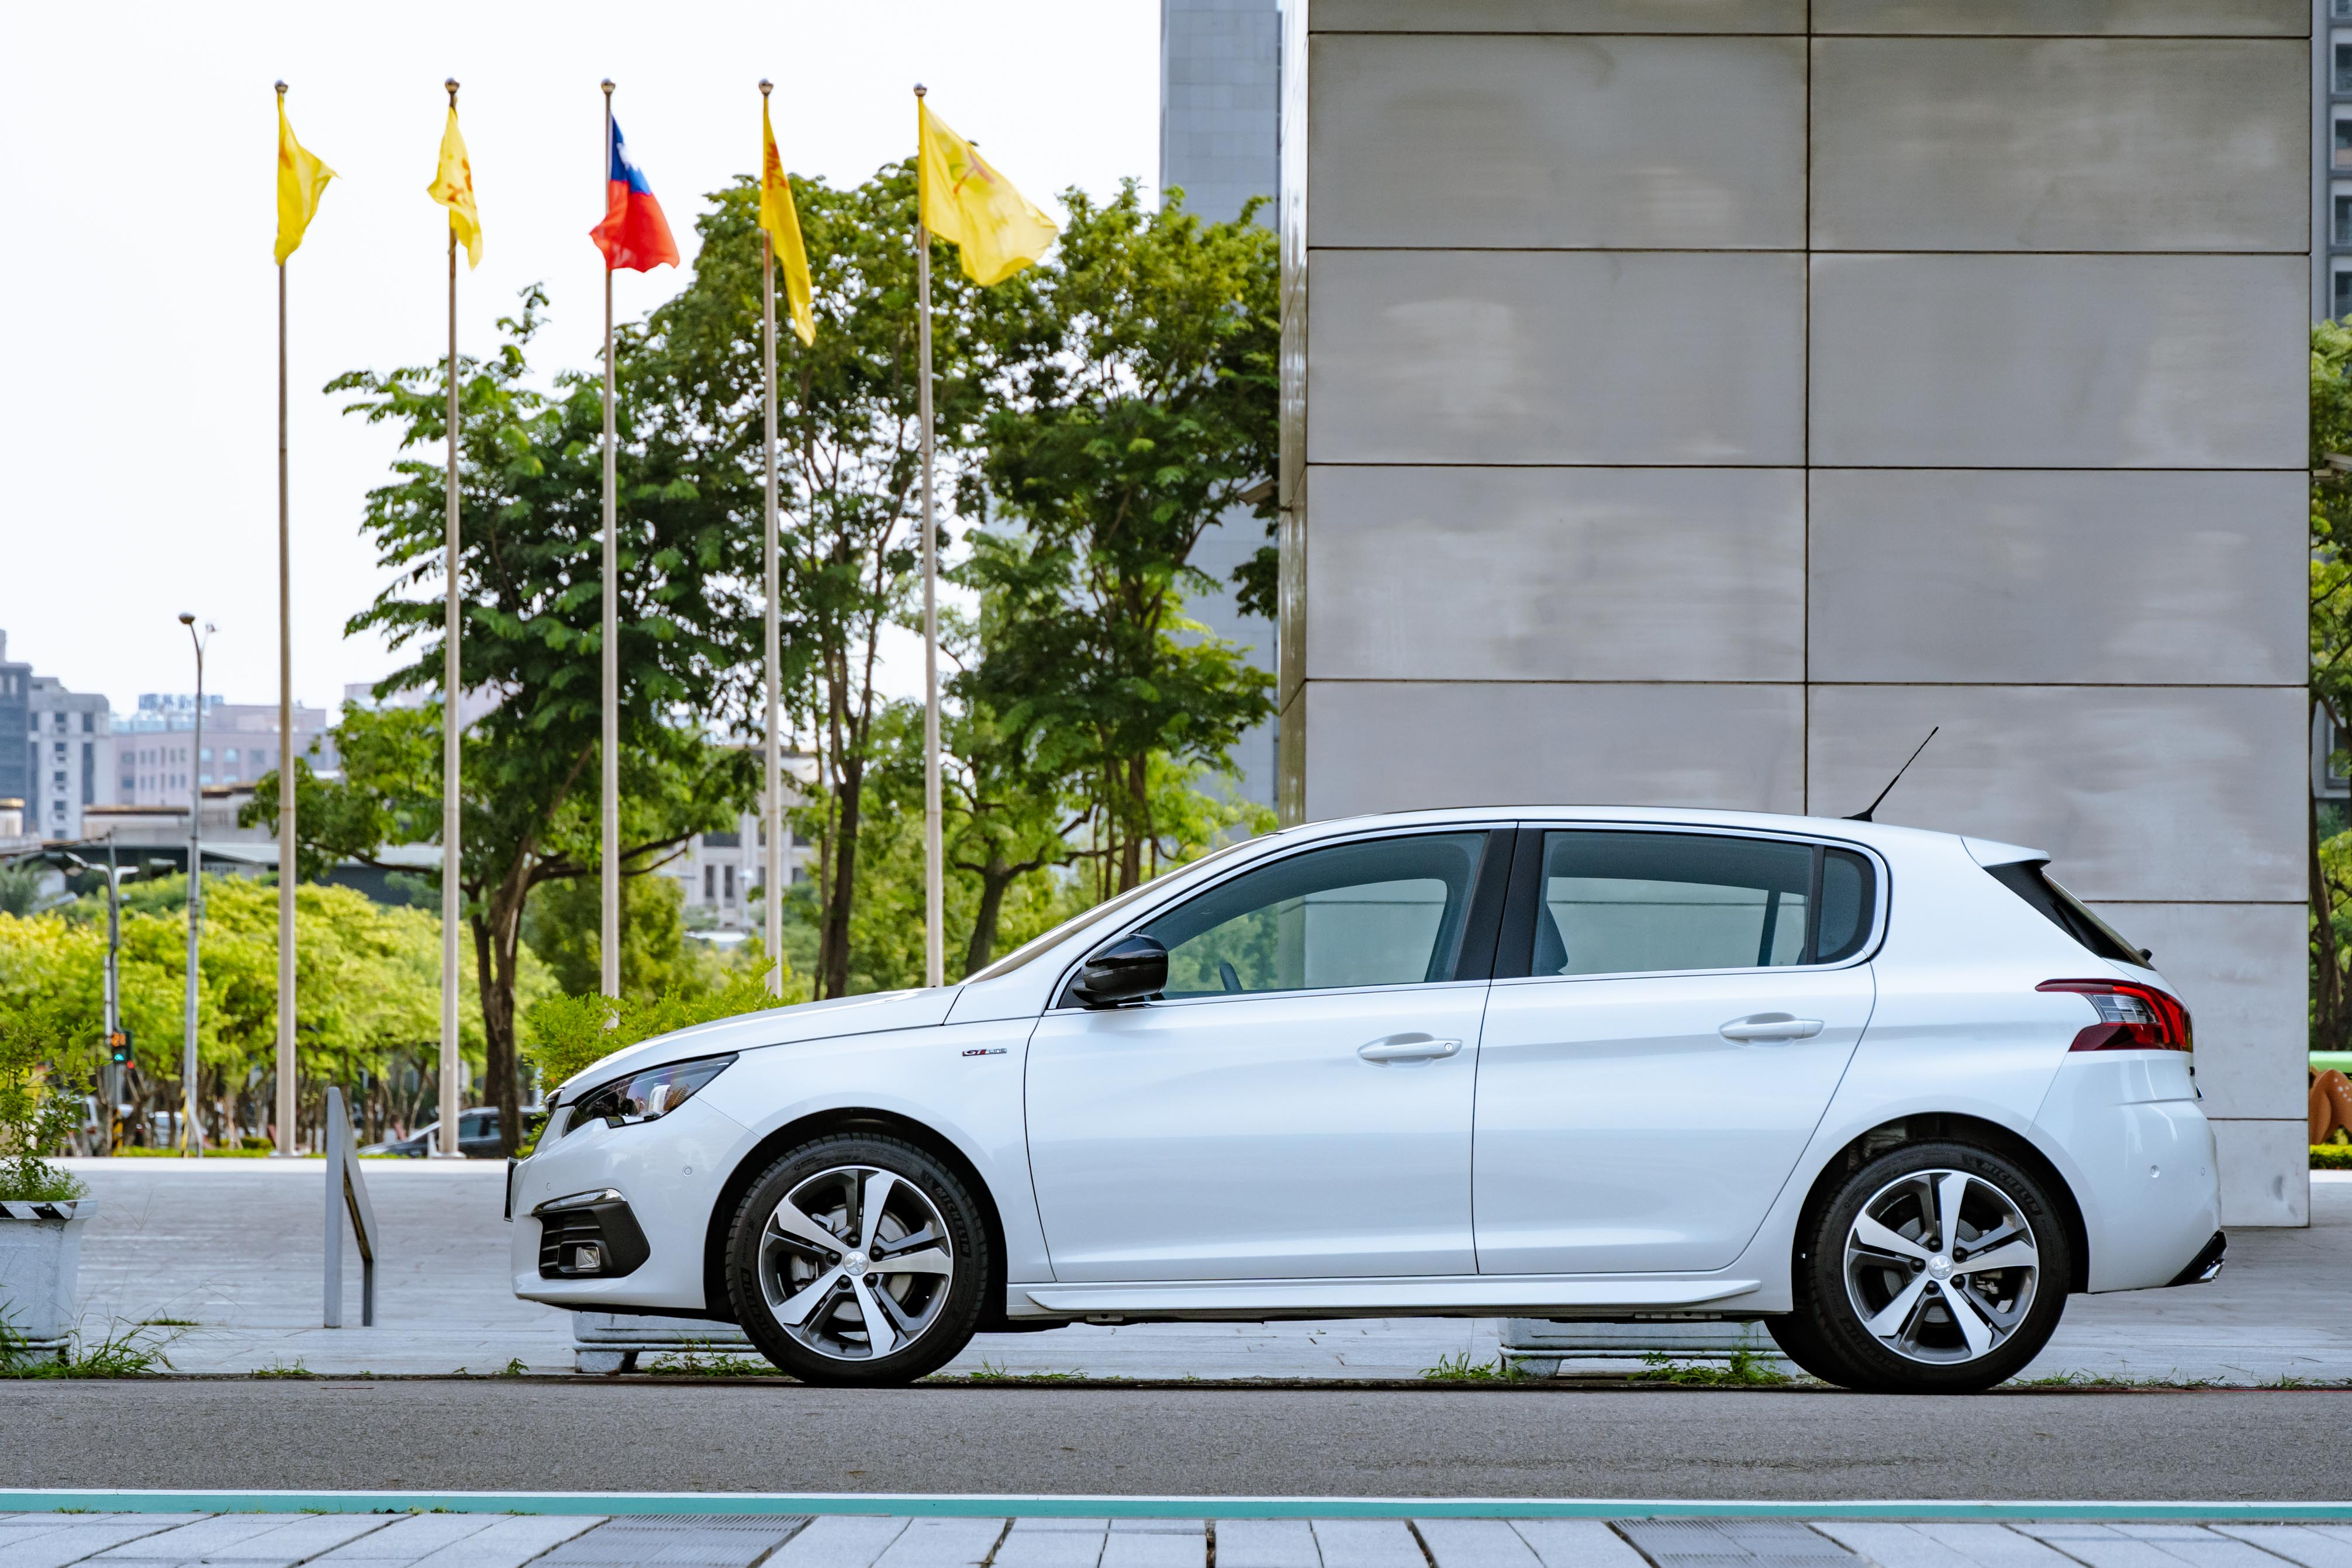 308 Peugeot 適合喜歡五門掀背,也喜歡稀有感的買家。